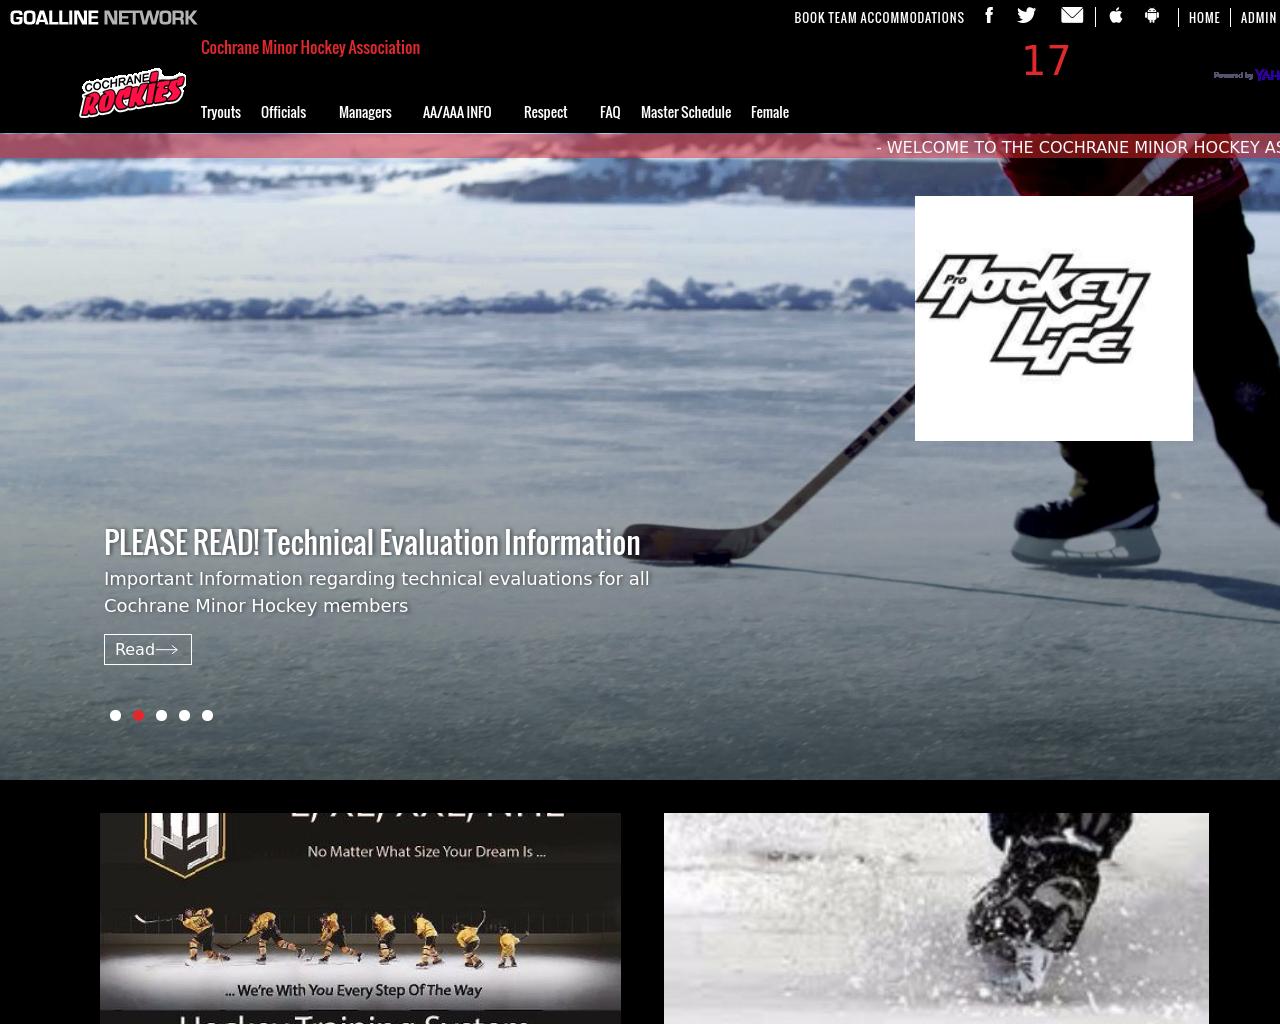 Cochrane-Minor-Hockey-Association-Advertising-Reviews-Pricing